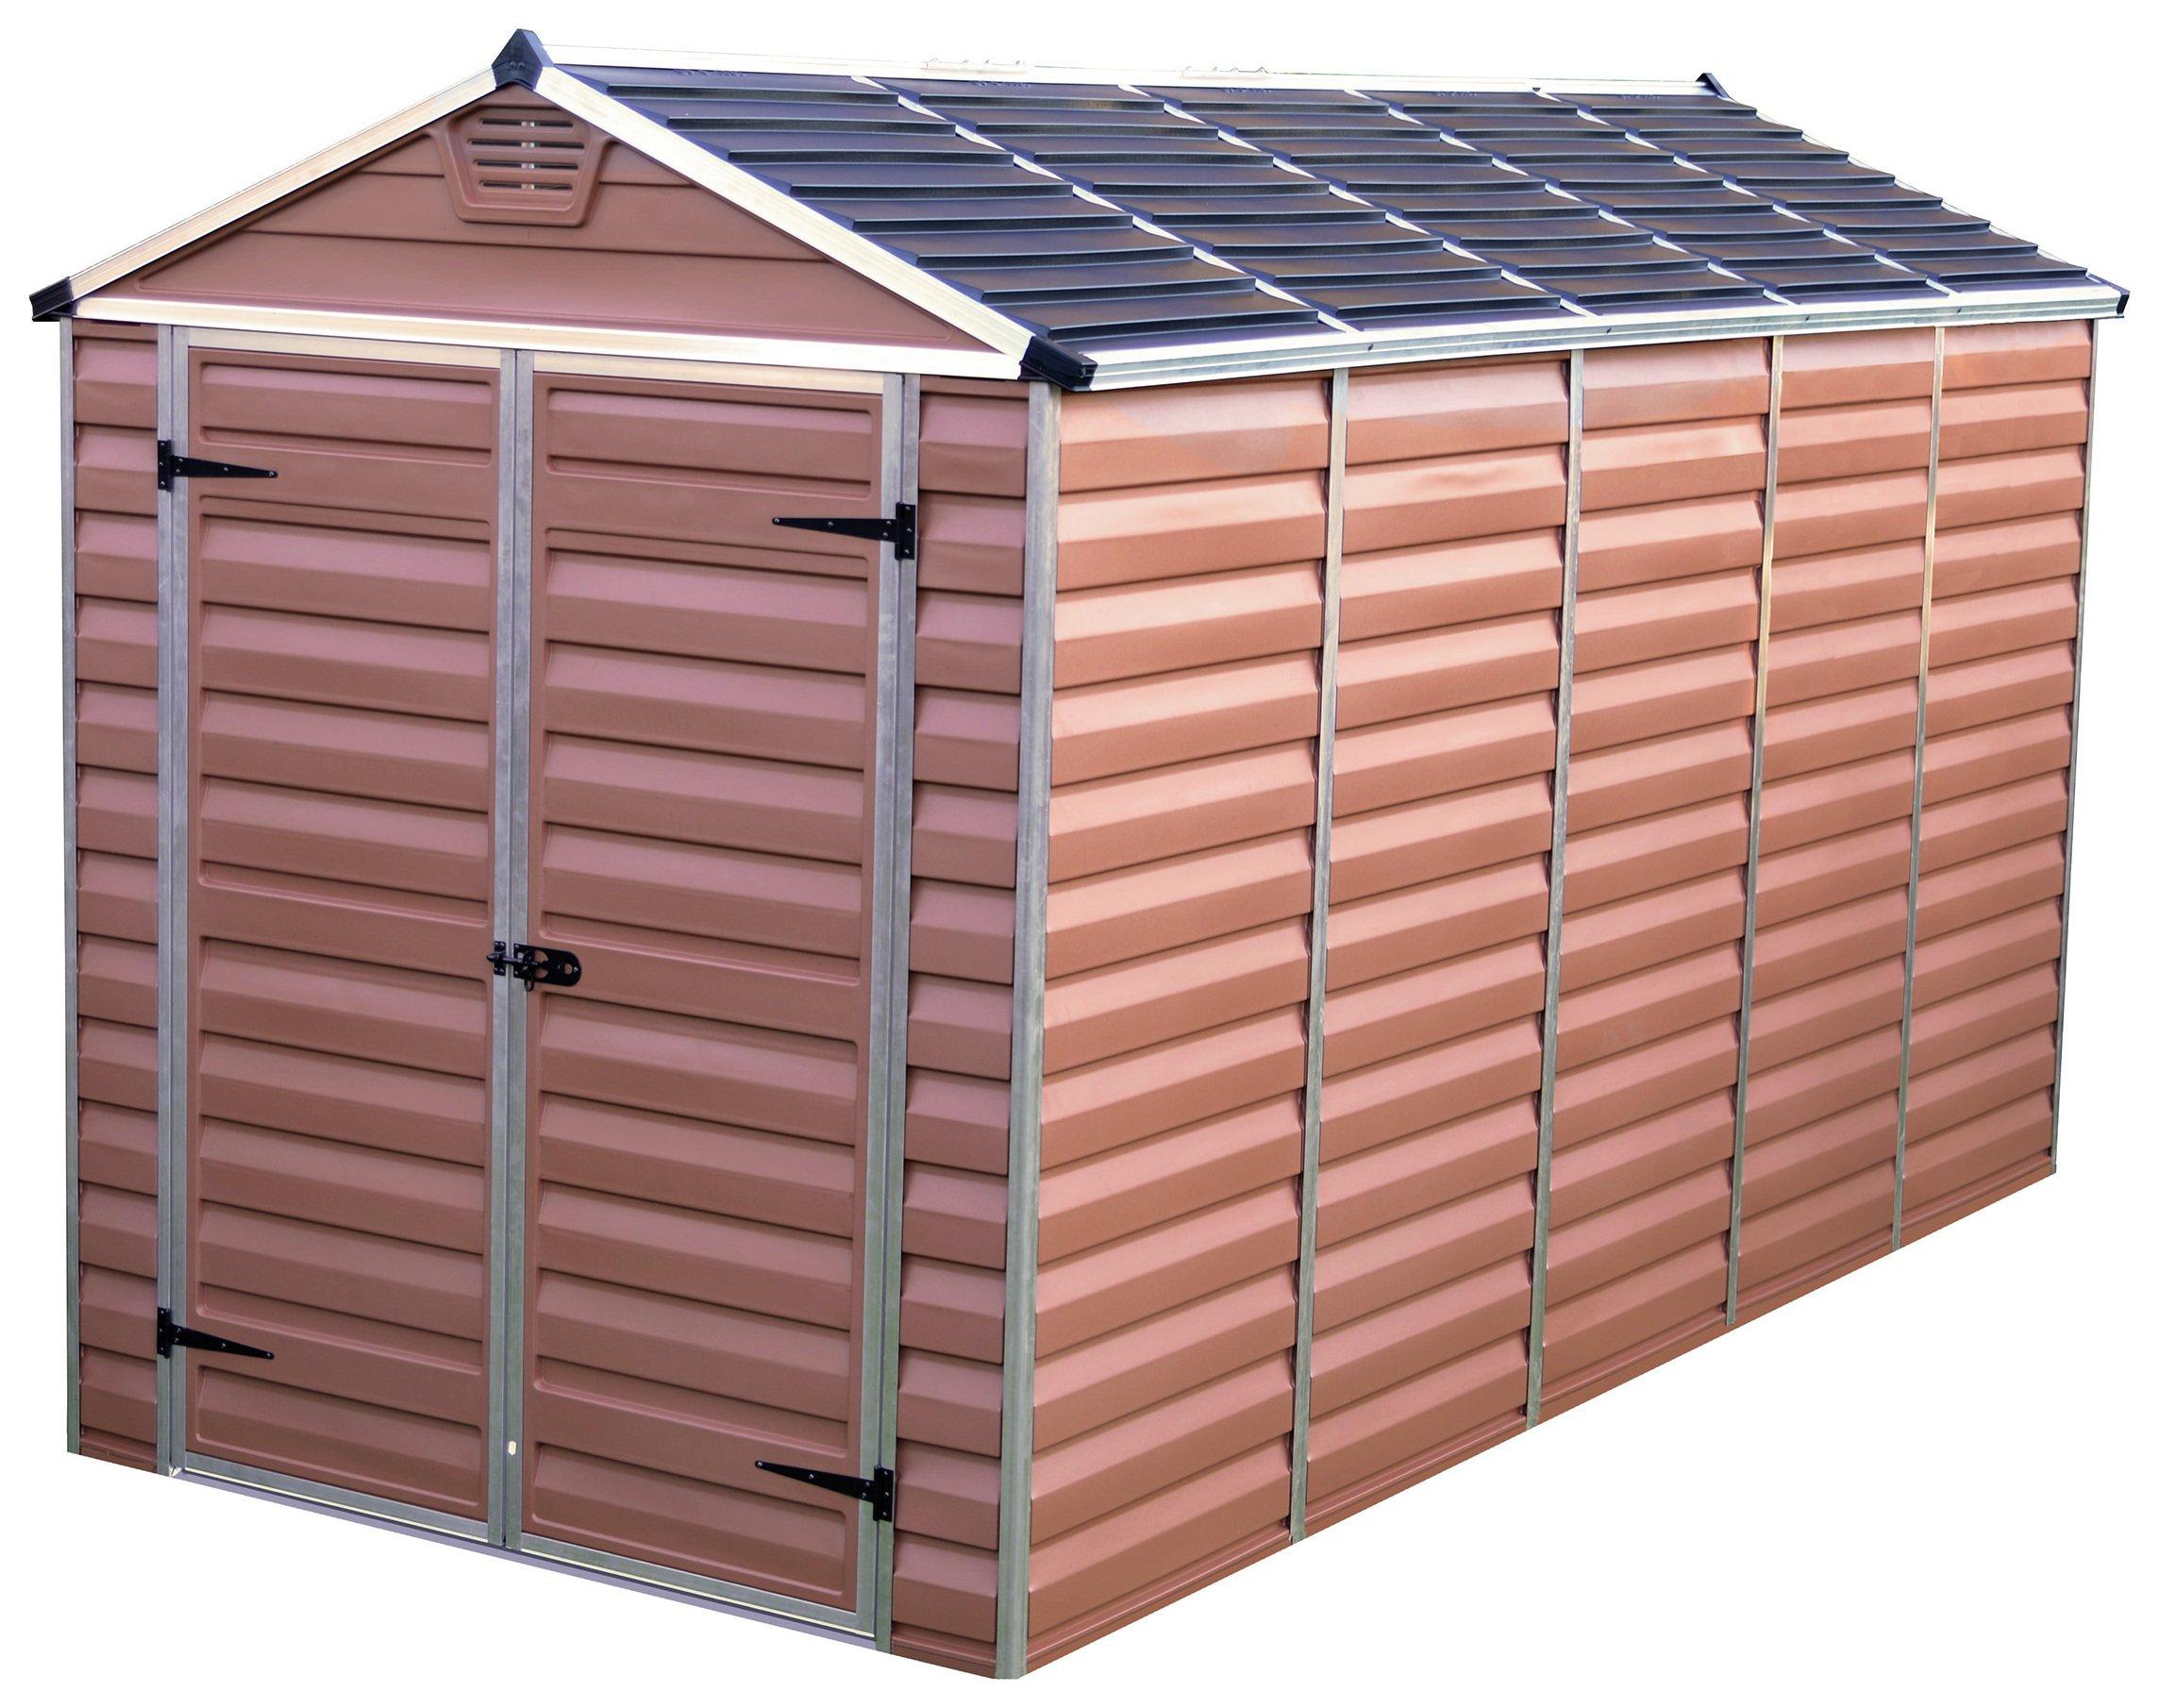 Palram Skylight Plastic 6 x 12ft Garden Shed - Amber